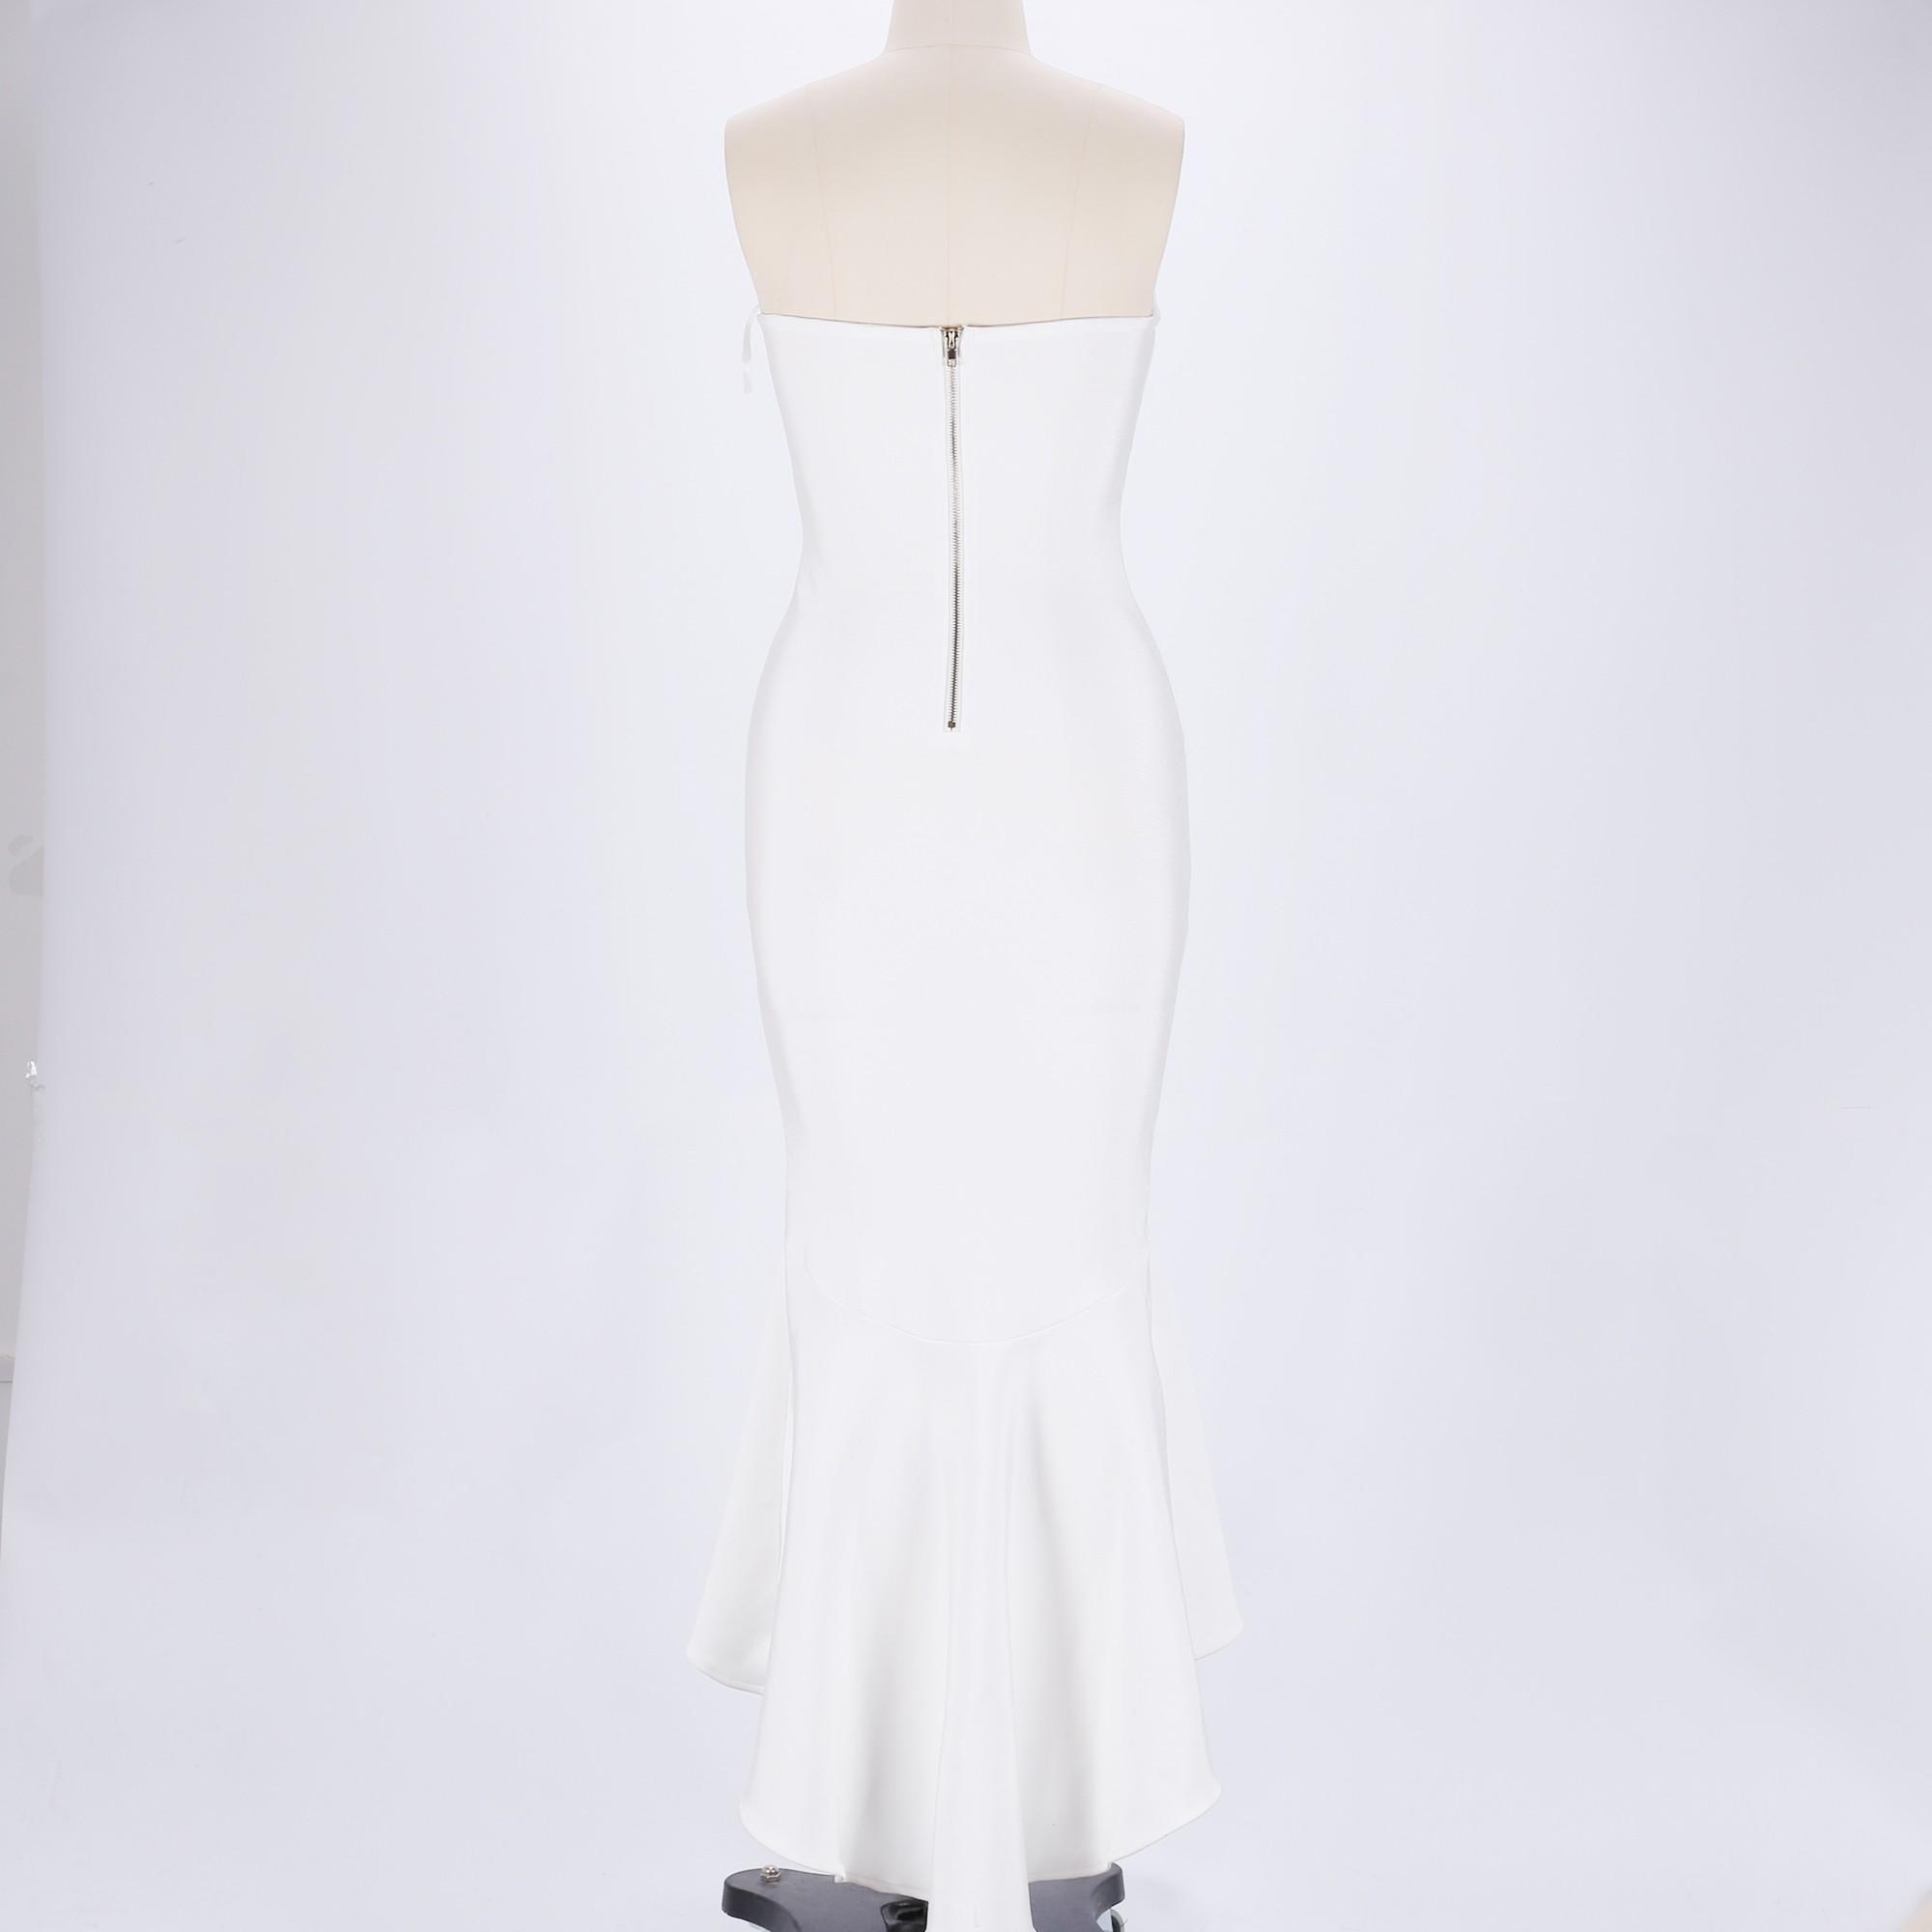 White Strapless Sleeveless Maxi Mermaid Dress Party Bandage Dress HB5354-White